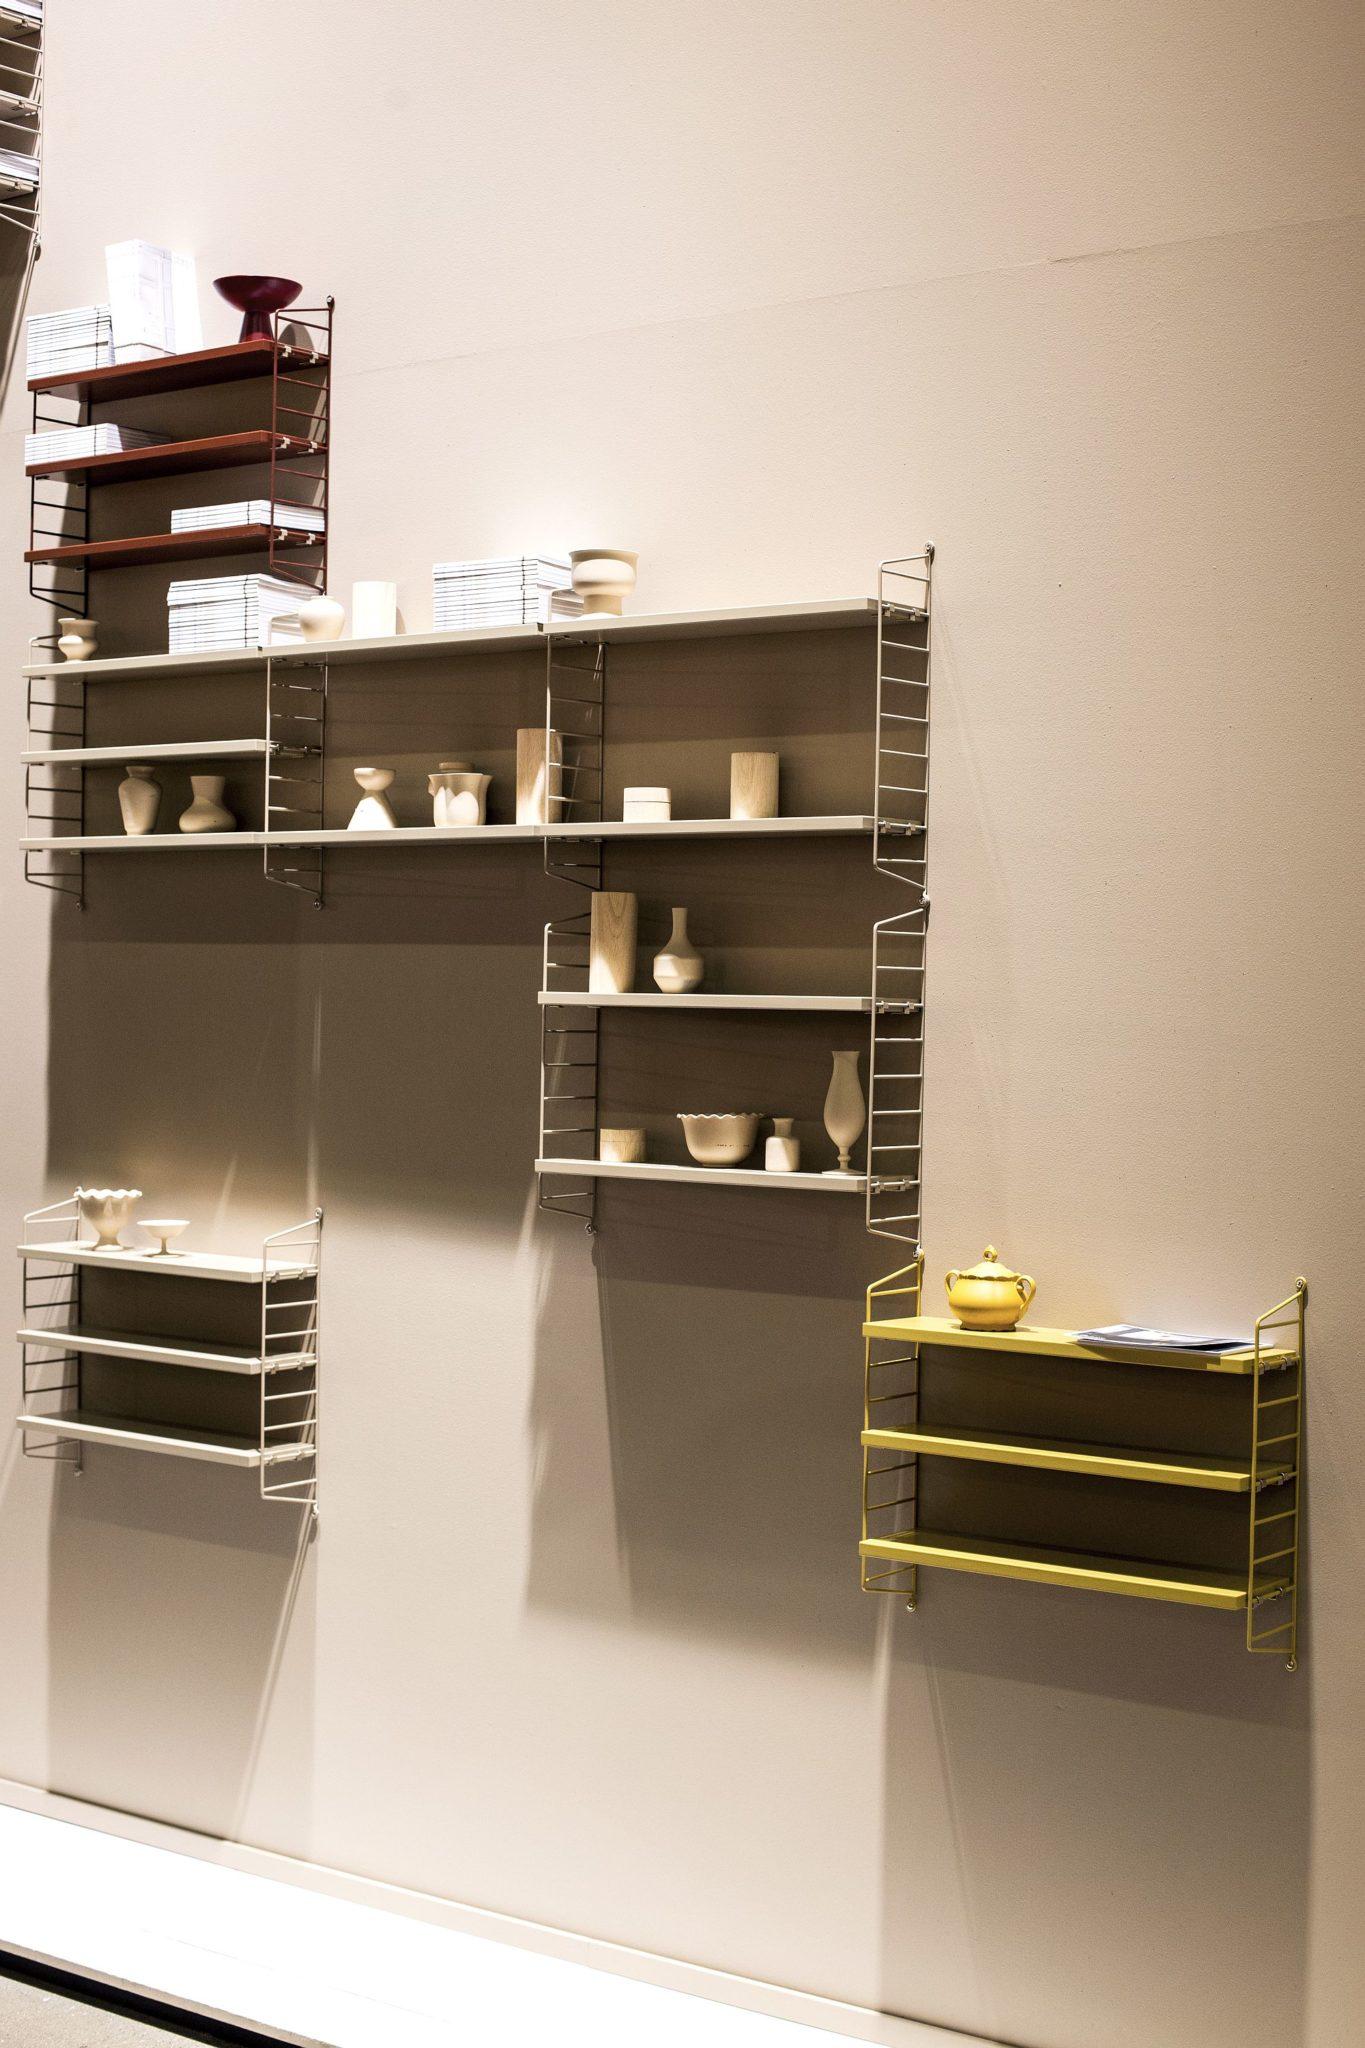 Ergonomic String shelving system for the home office